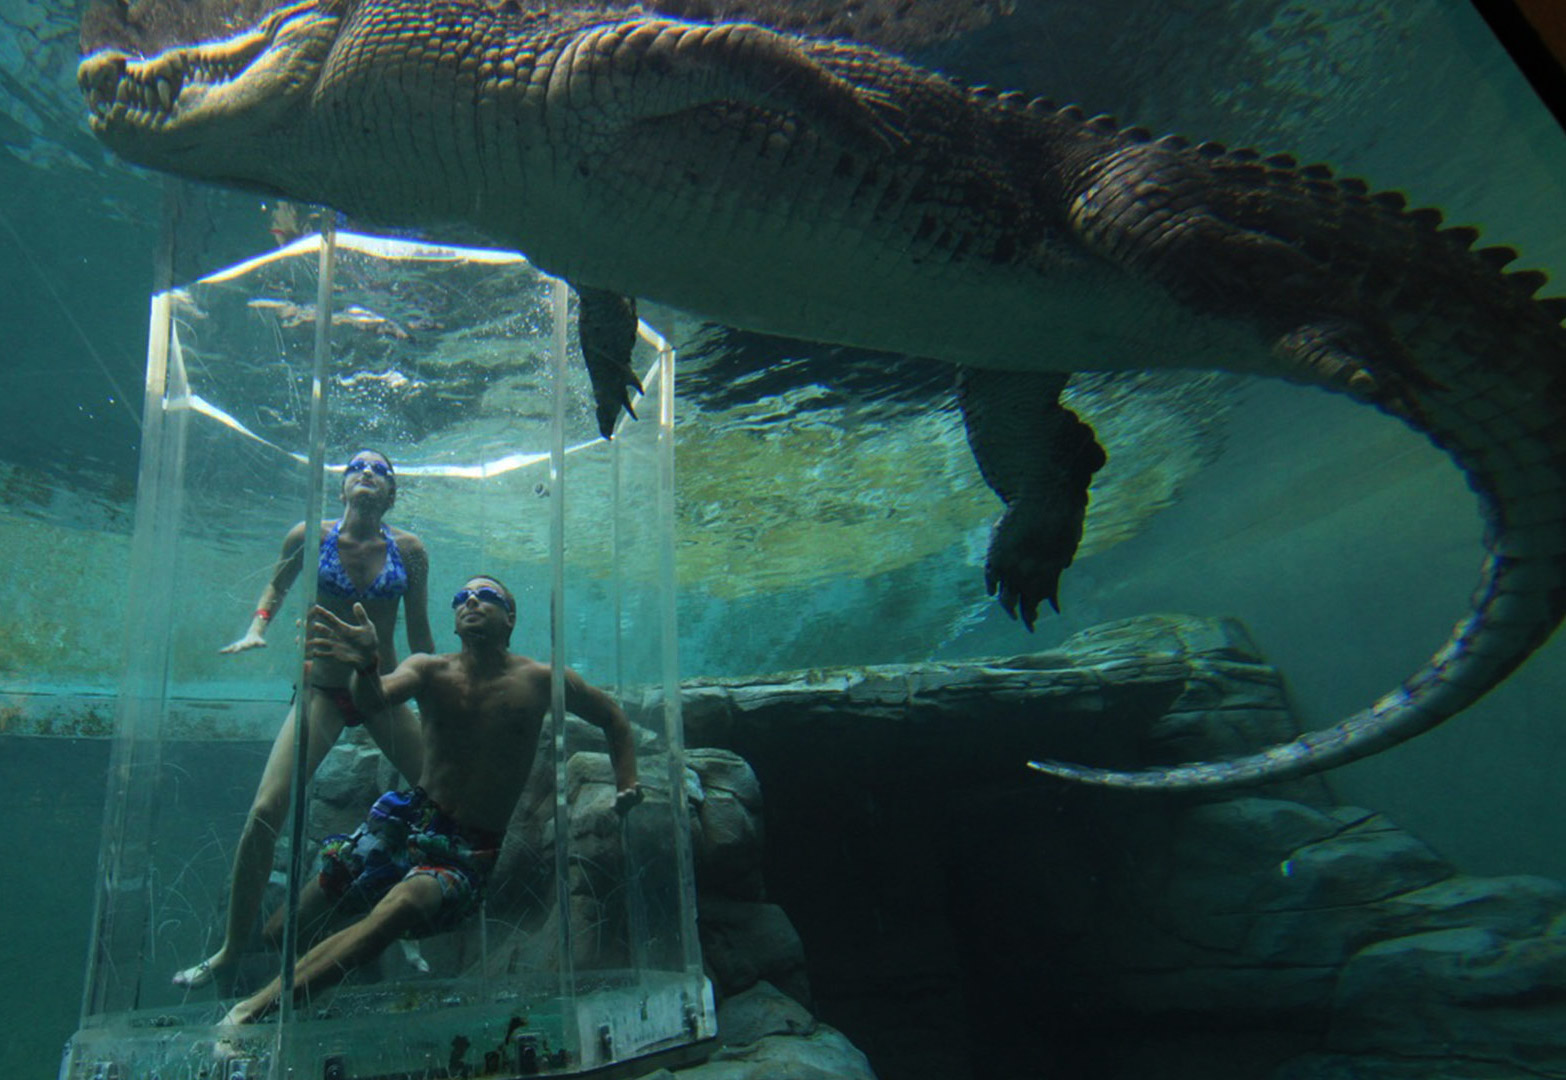 crocosaurus-cove--cage-of-death-02